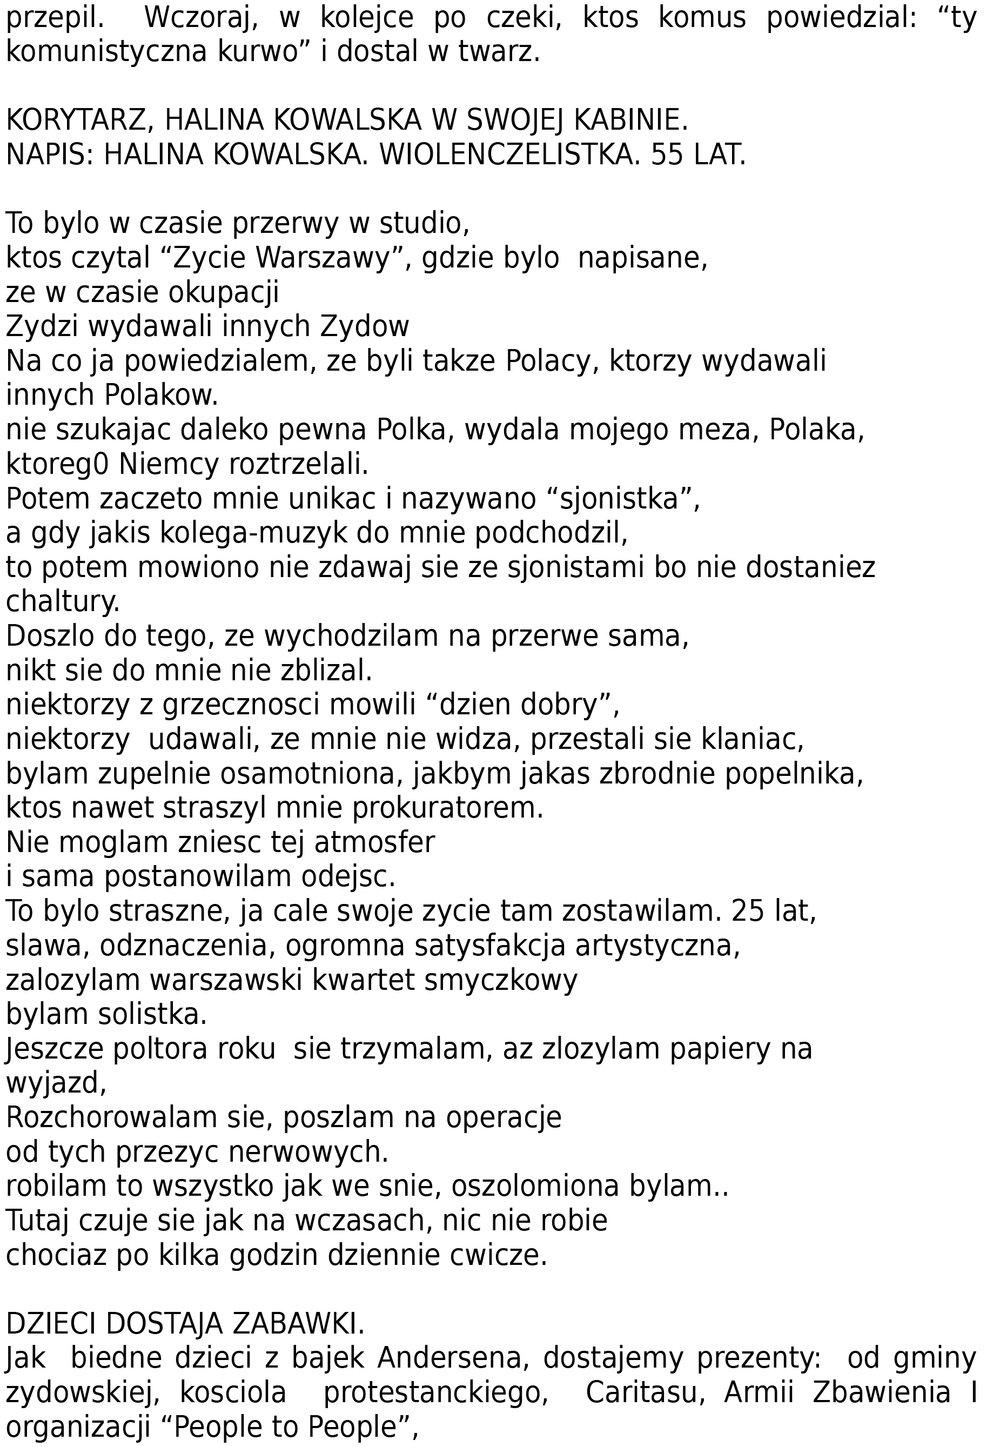 SKIBET-WERSJA-POLSKA-6.jpg